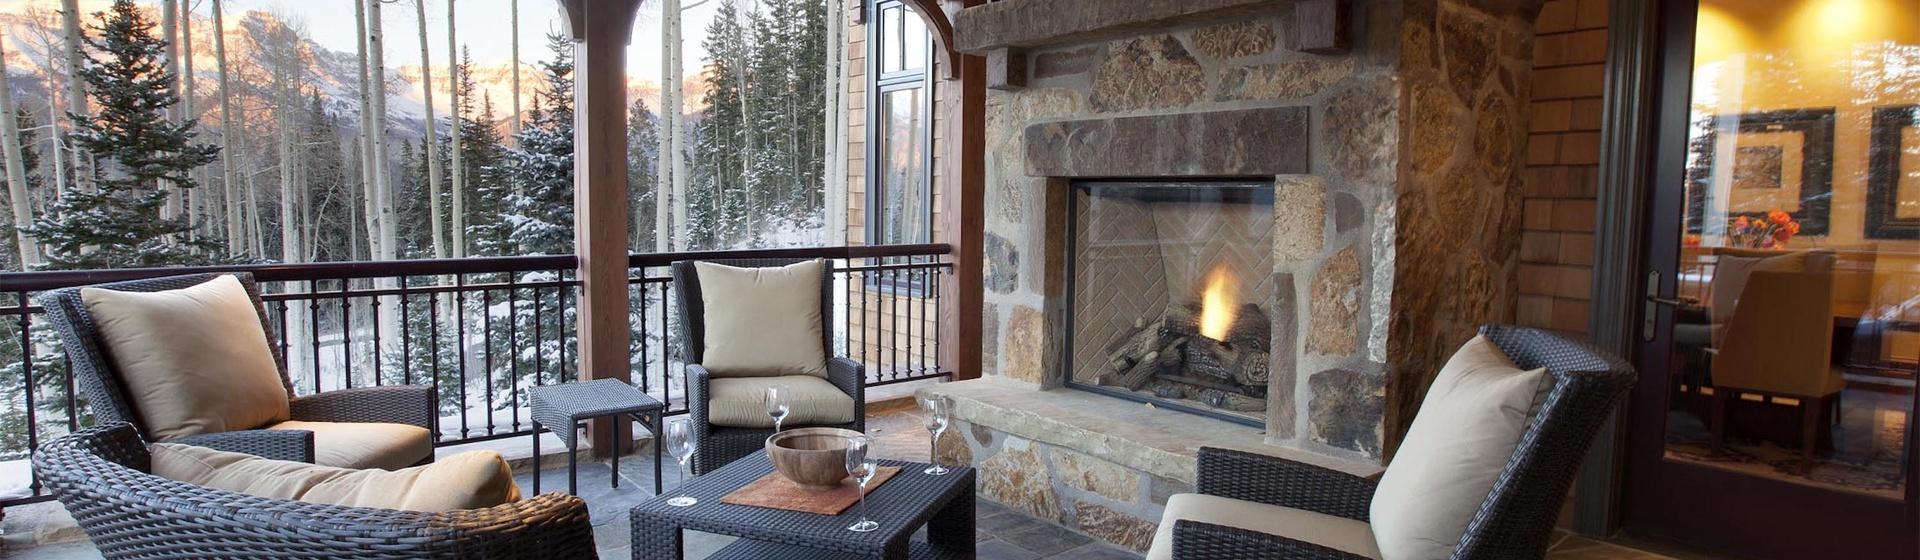 7.01-mountain-village-hood-park-manor-outdoor-fireplace-lounge-track.jpg